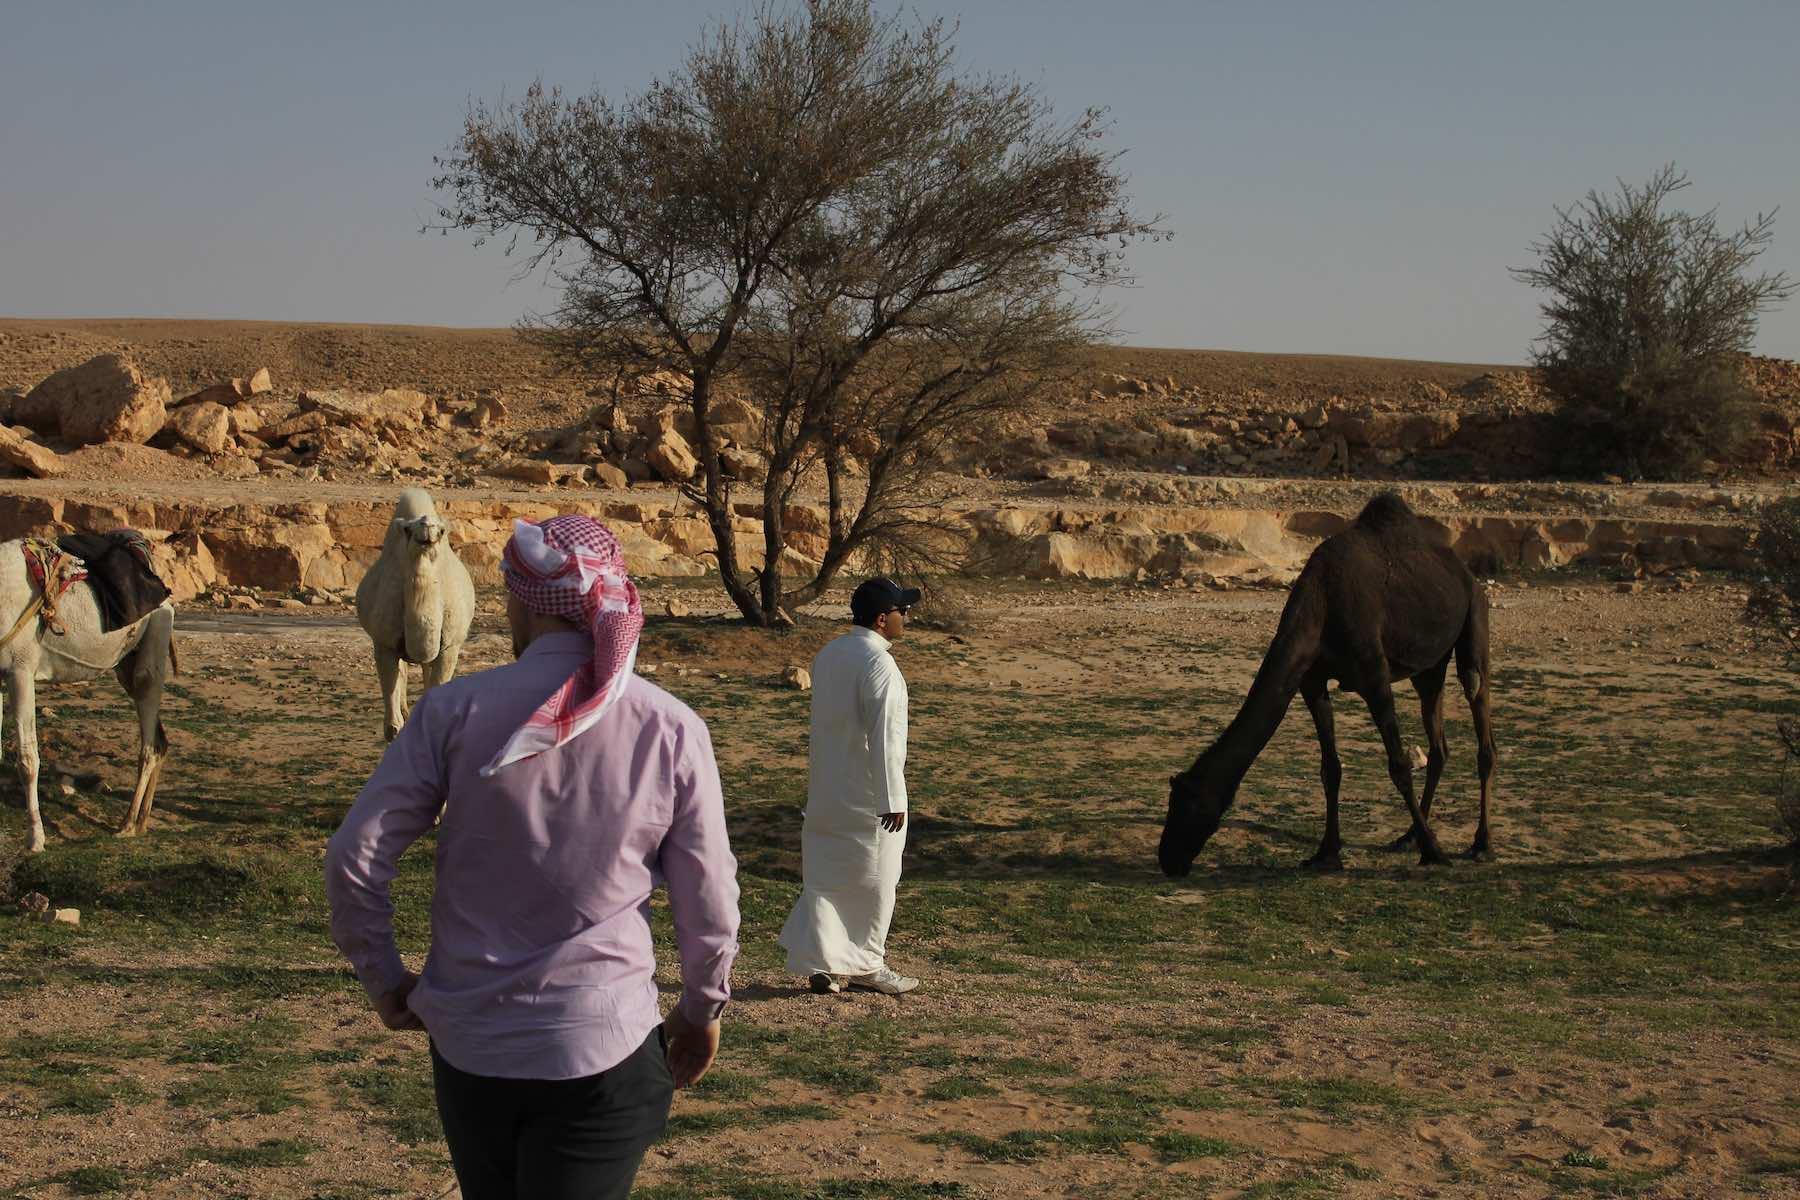 Kameler i Saudi Arabien